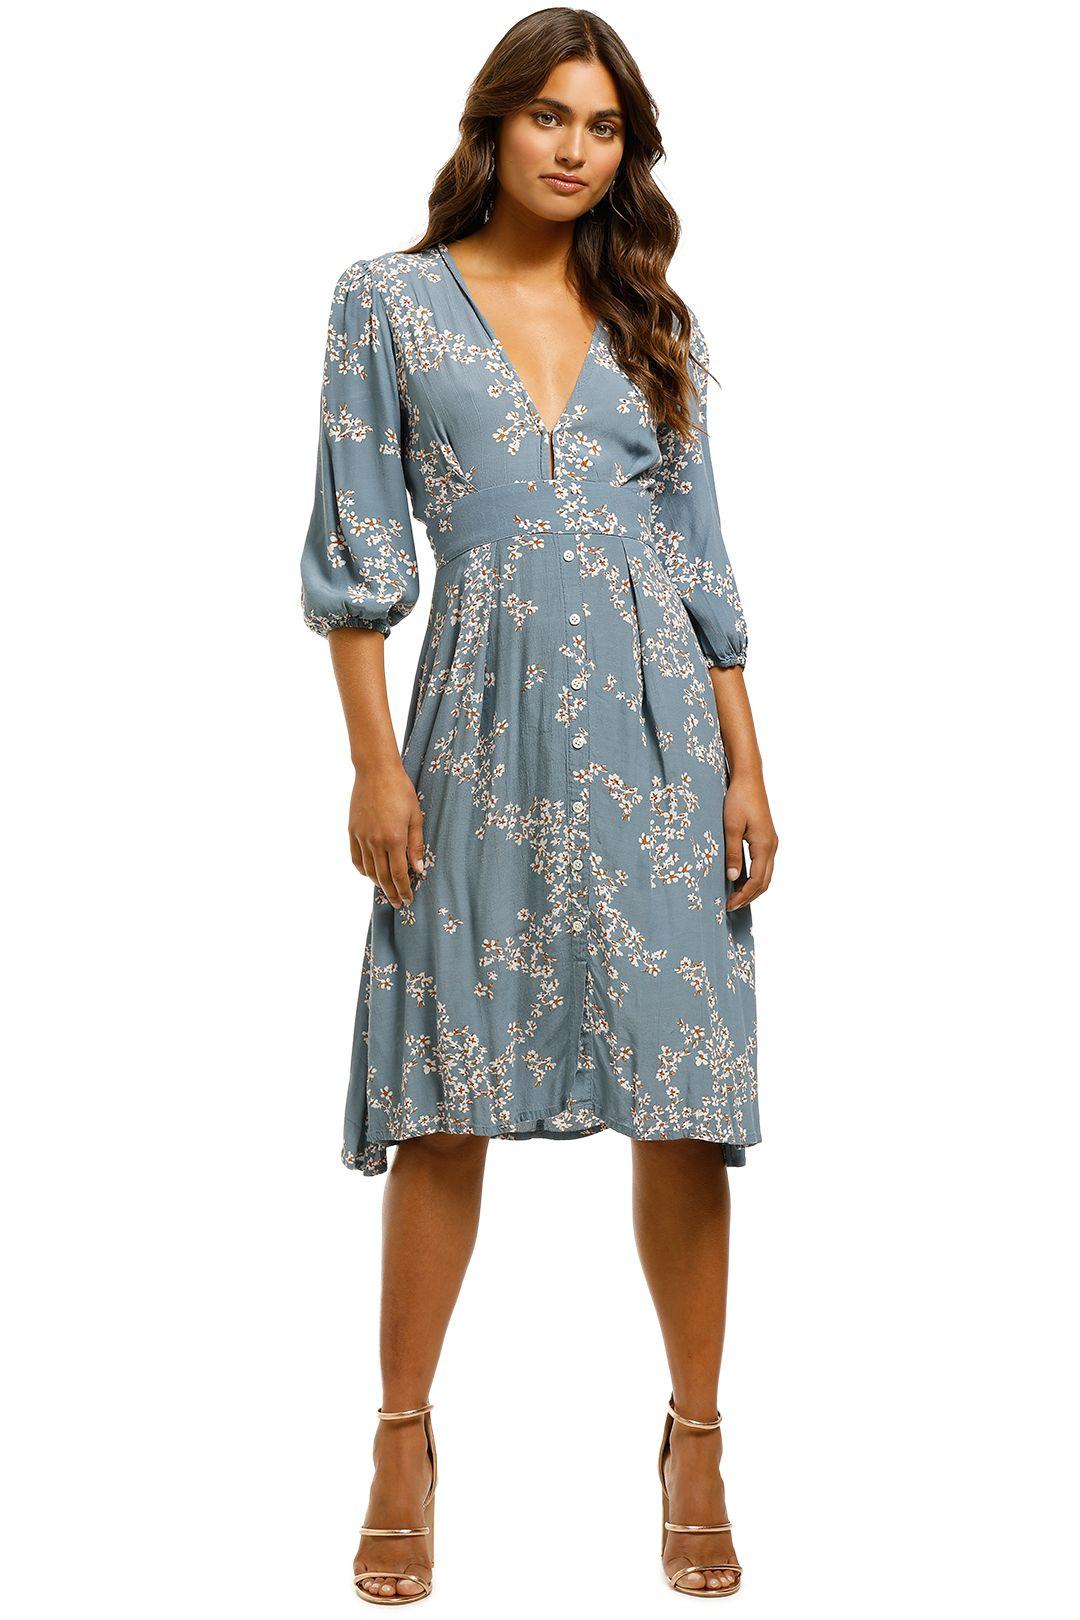 Faithfull - Chloe Midi Dress - Cornflower Blue - Front